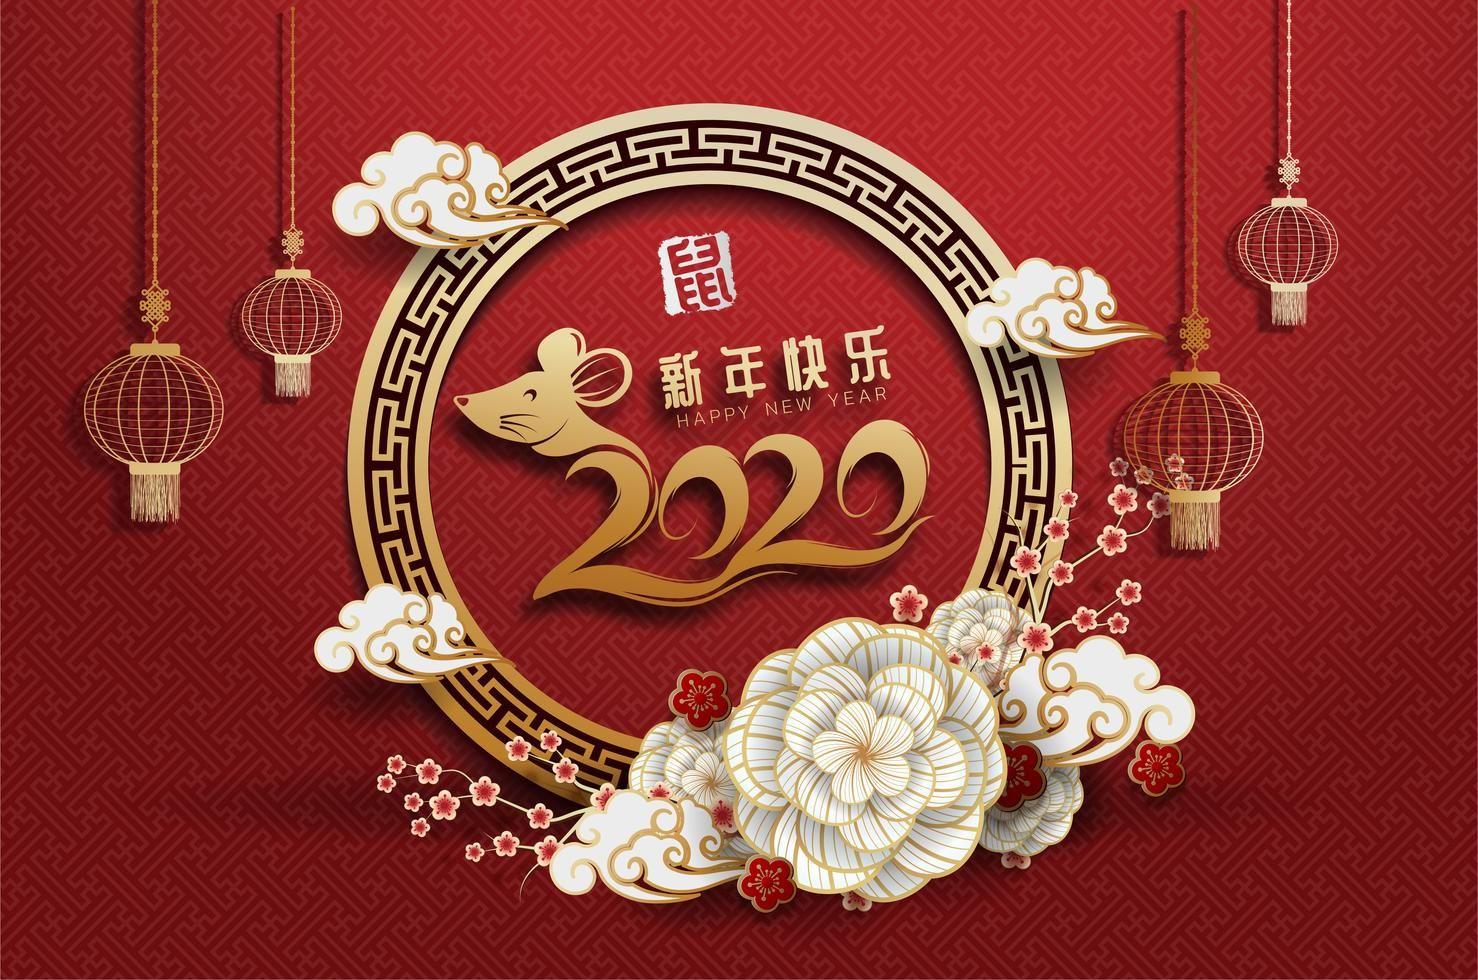 2020 chinese new year greeting card chinese new year